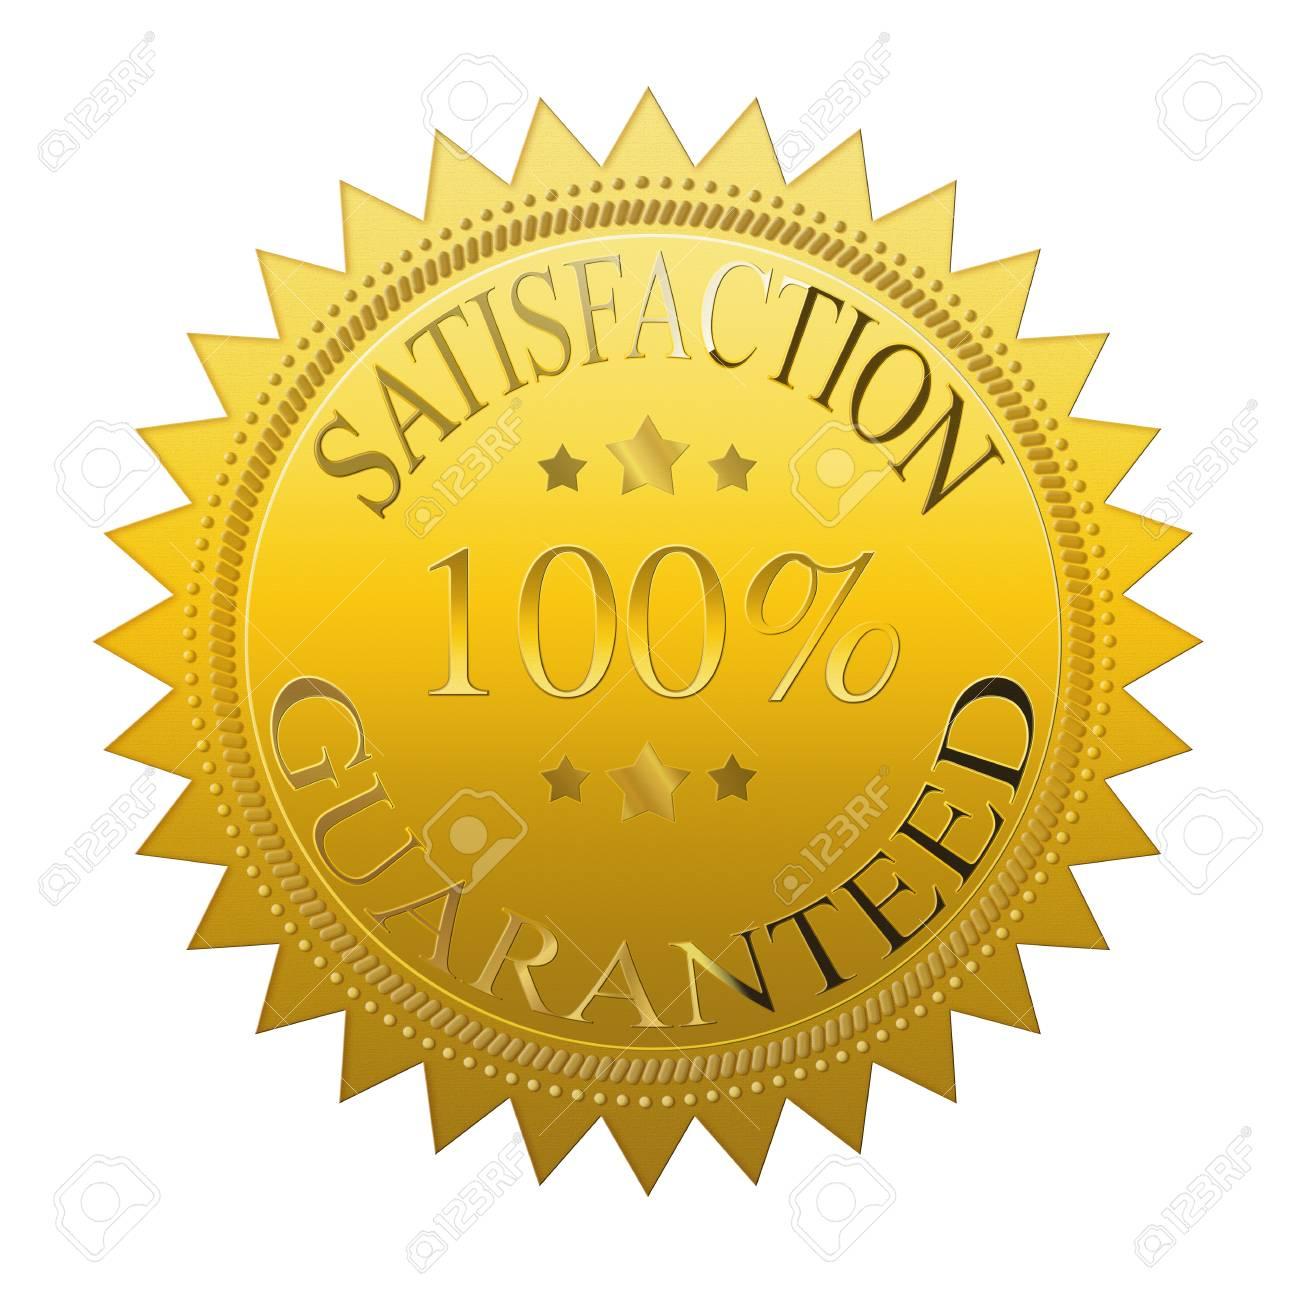 Guarantee certificate Stock Photo - 11472793